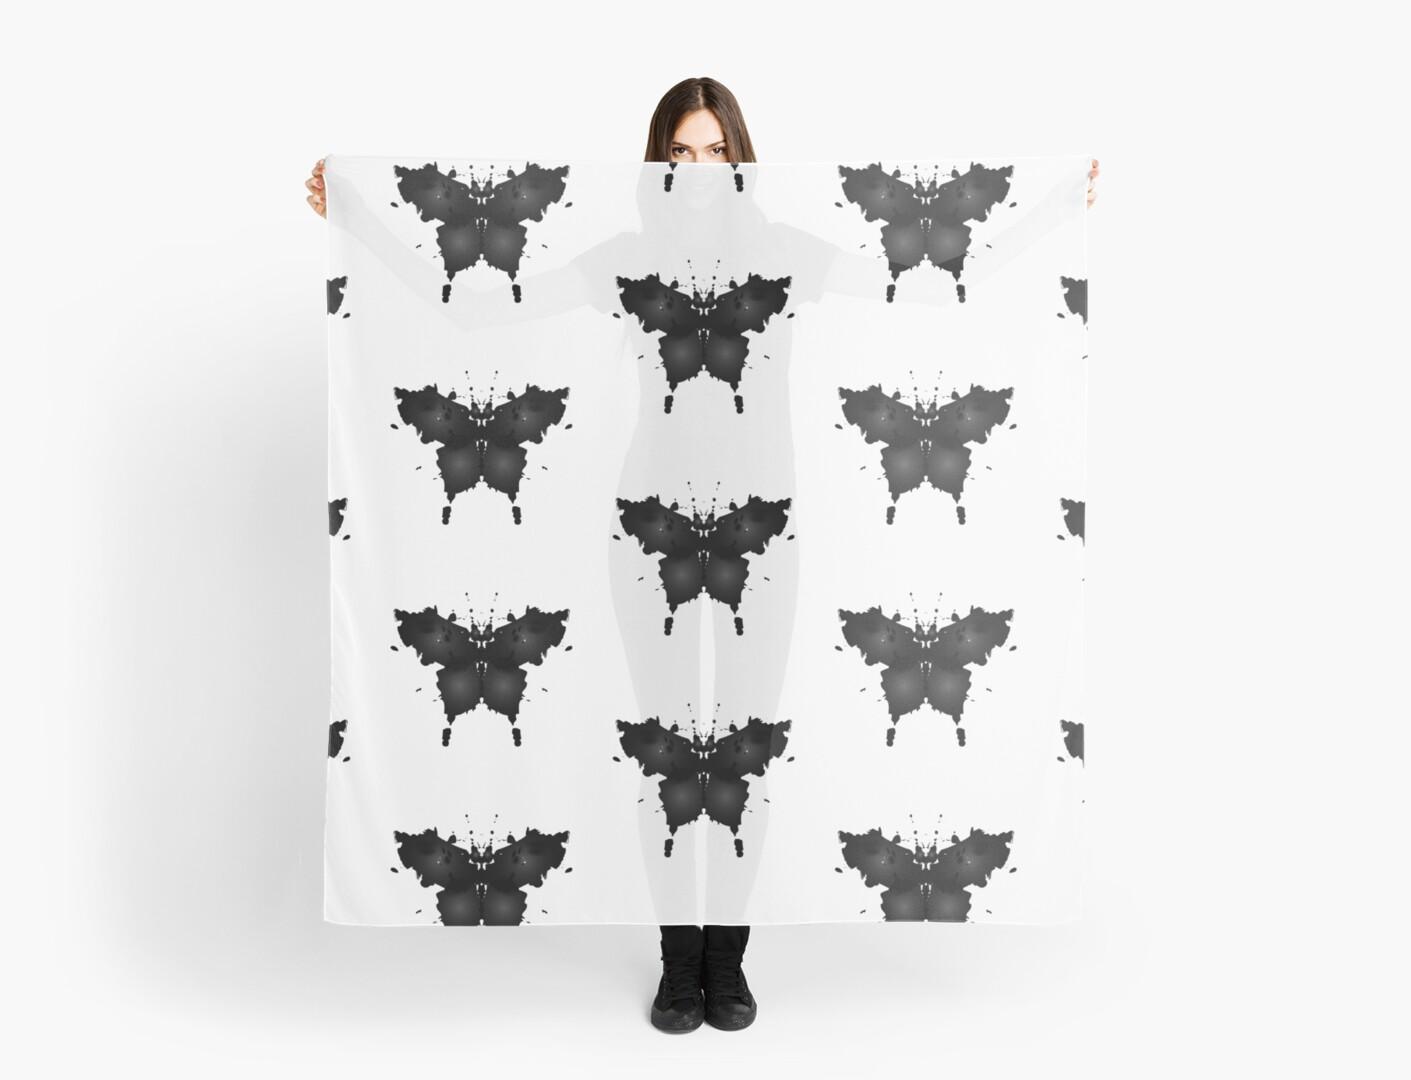 Black Butterfly by Kaylee Guy